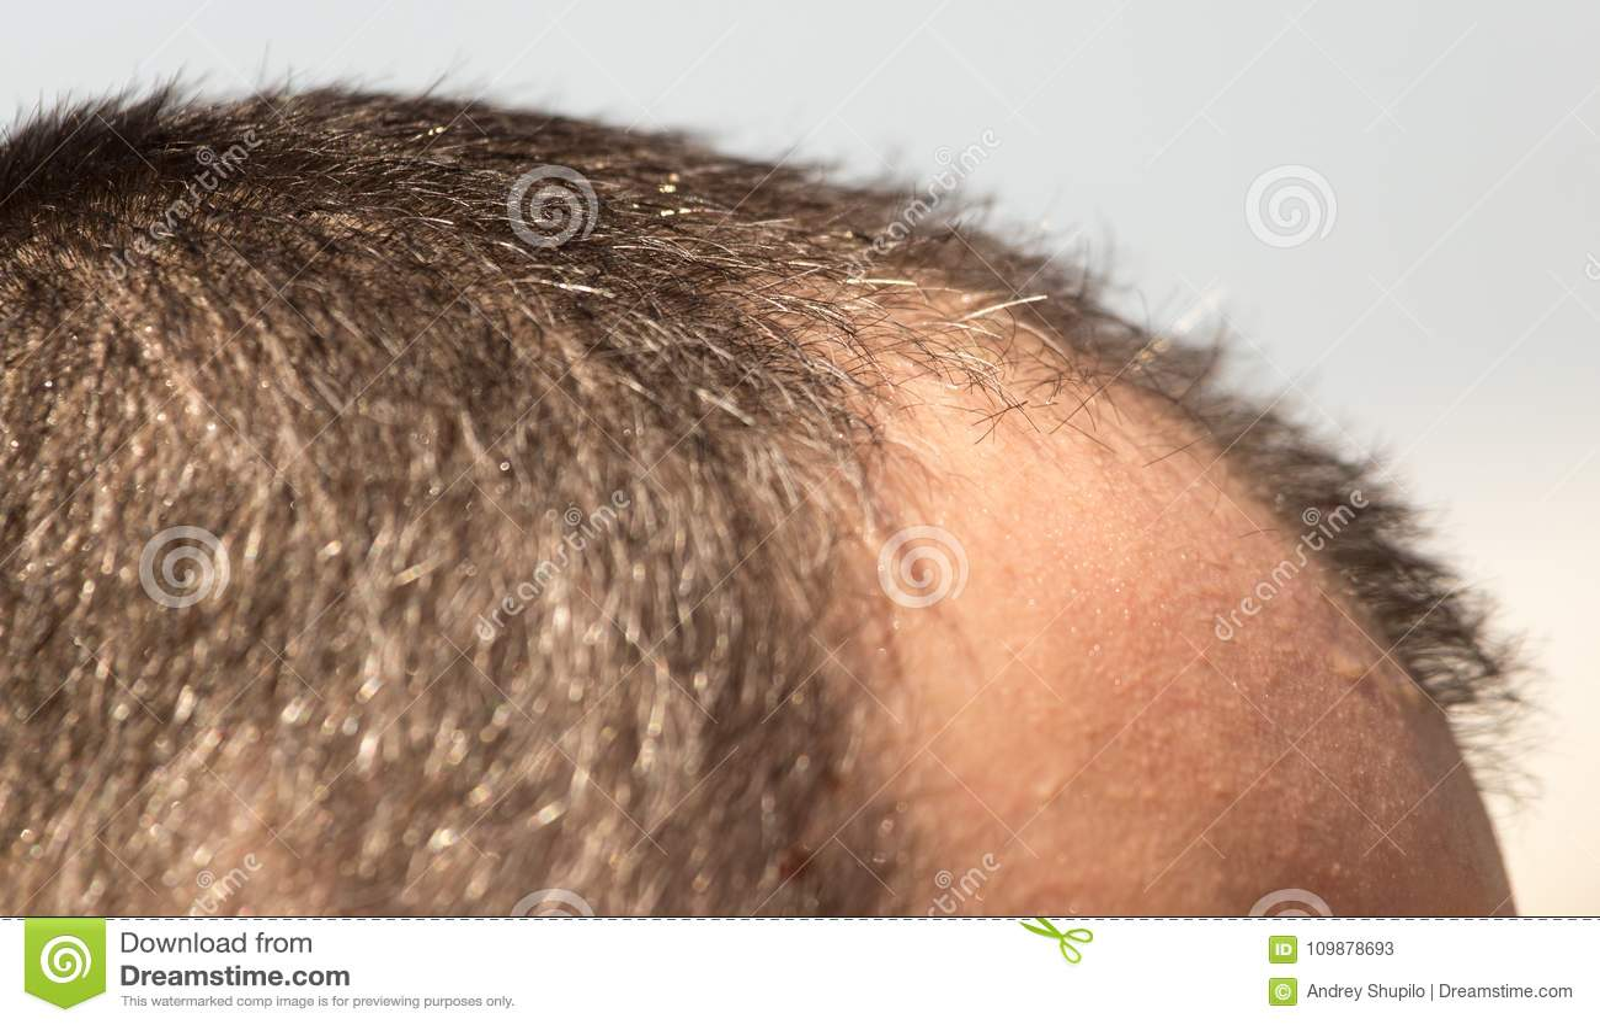 💄 bald spot on back of head